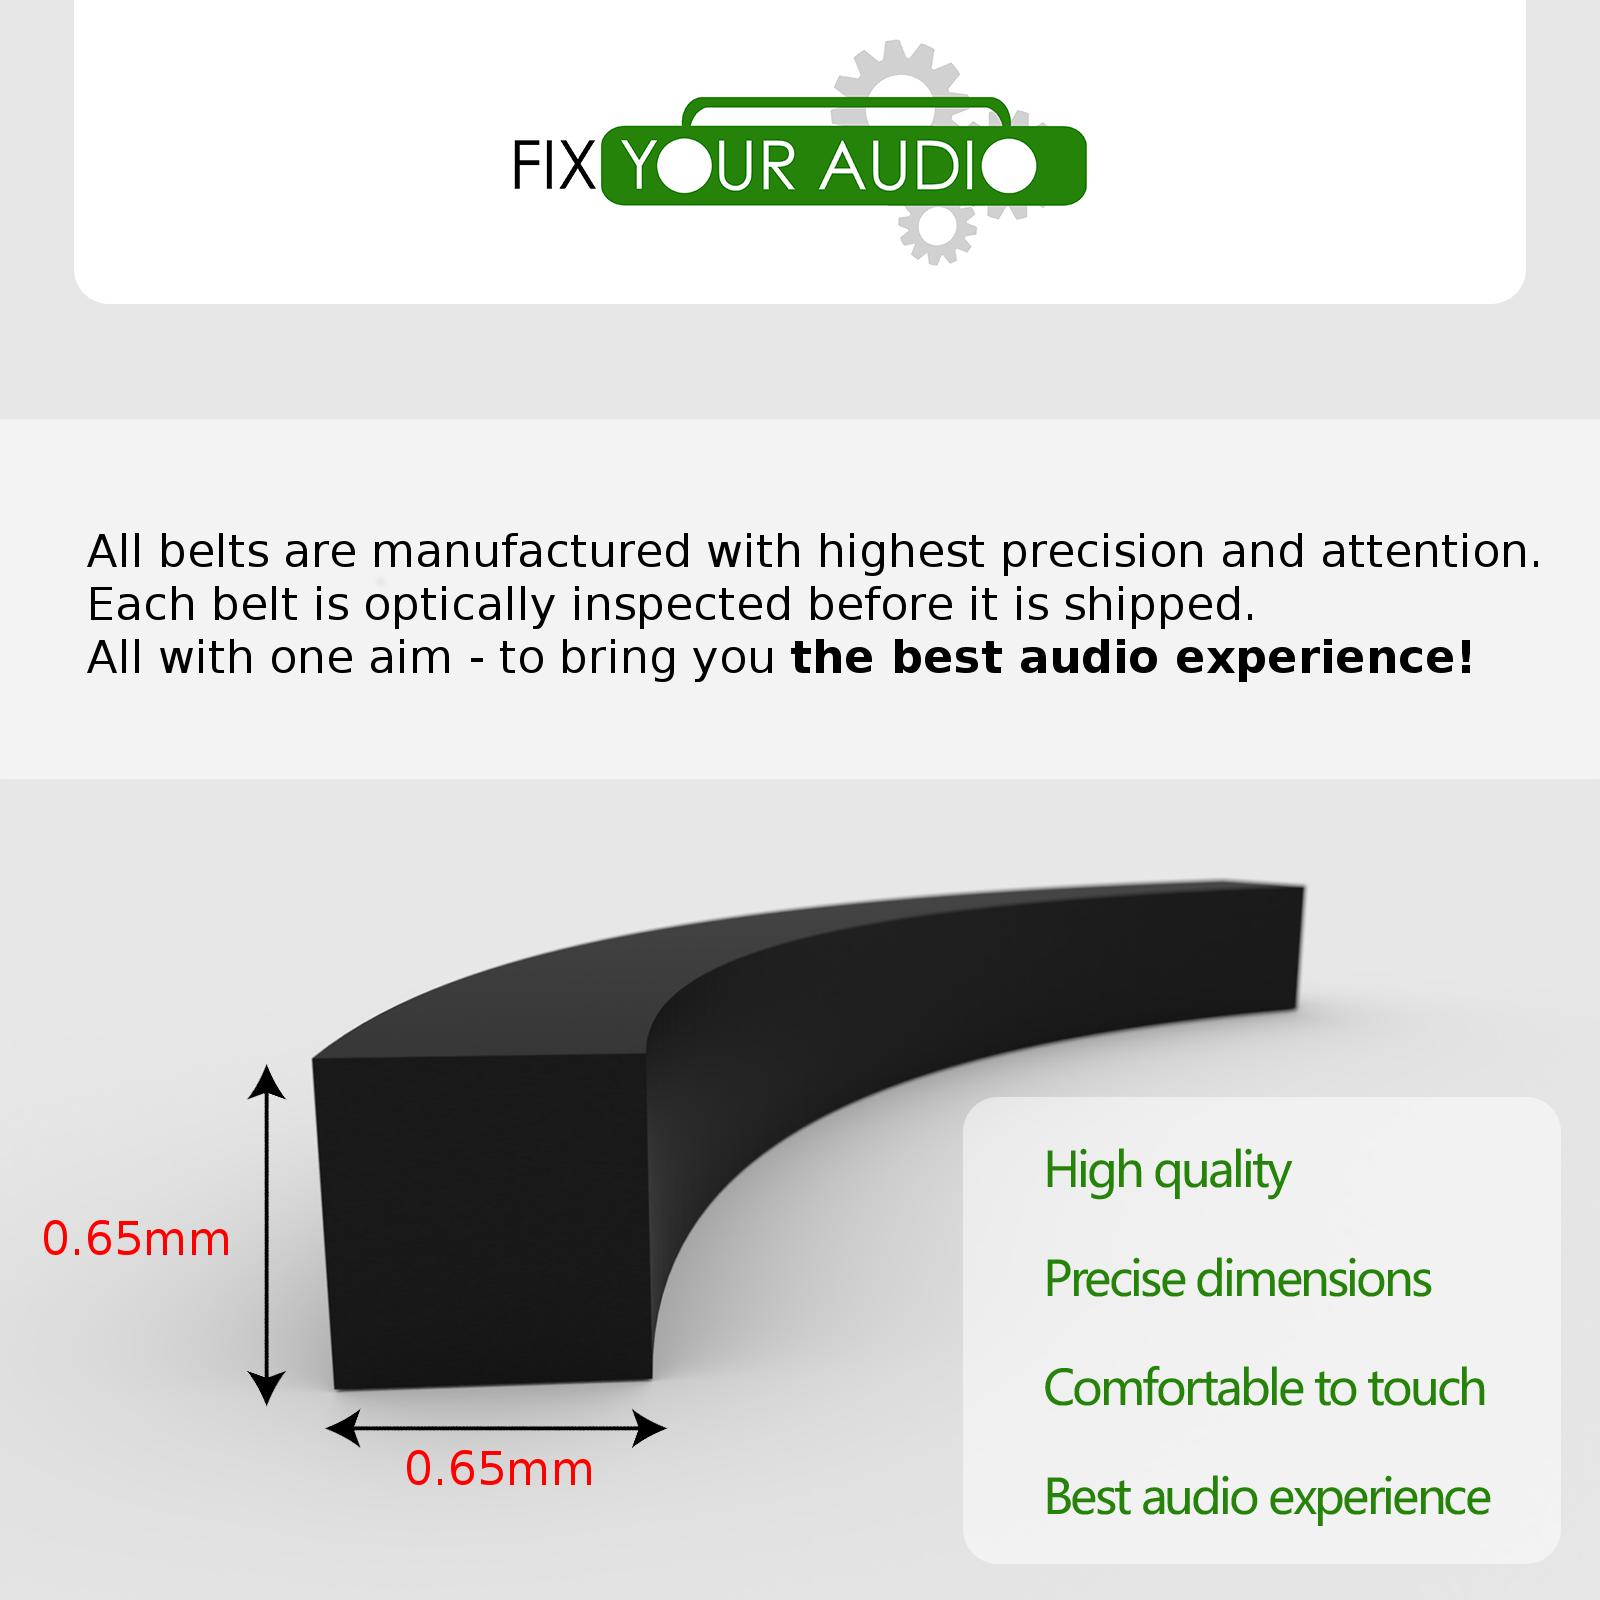 Belt for Sony WM-F2078 WM-F2081 WM-F2085 WM-FS421 WM-FS555 WM-FS556 Walkman